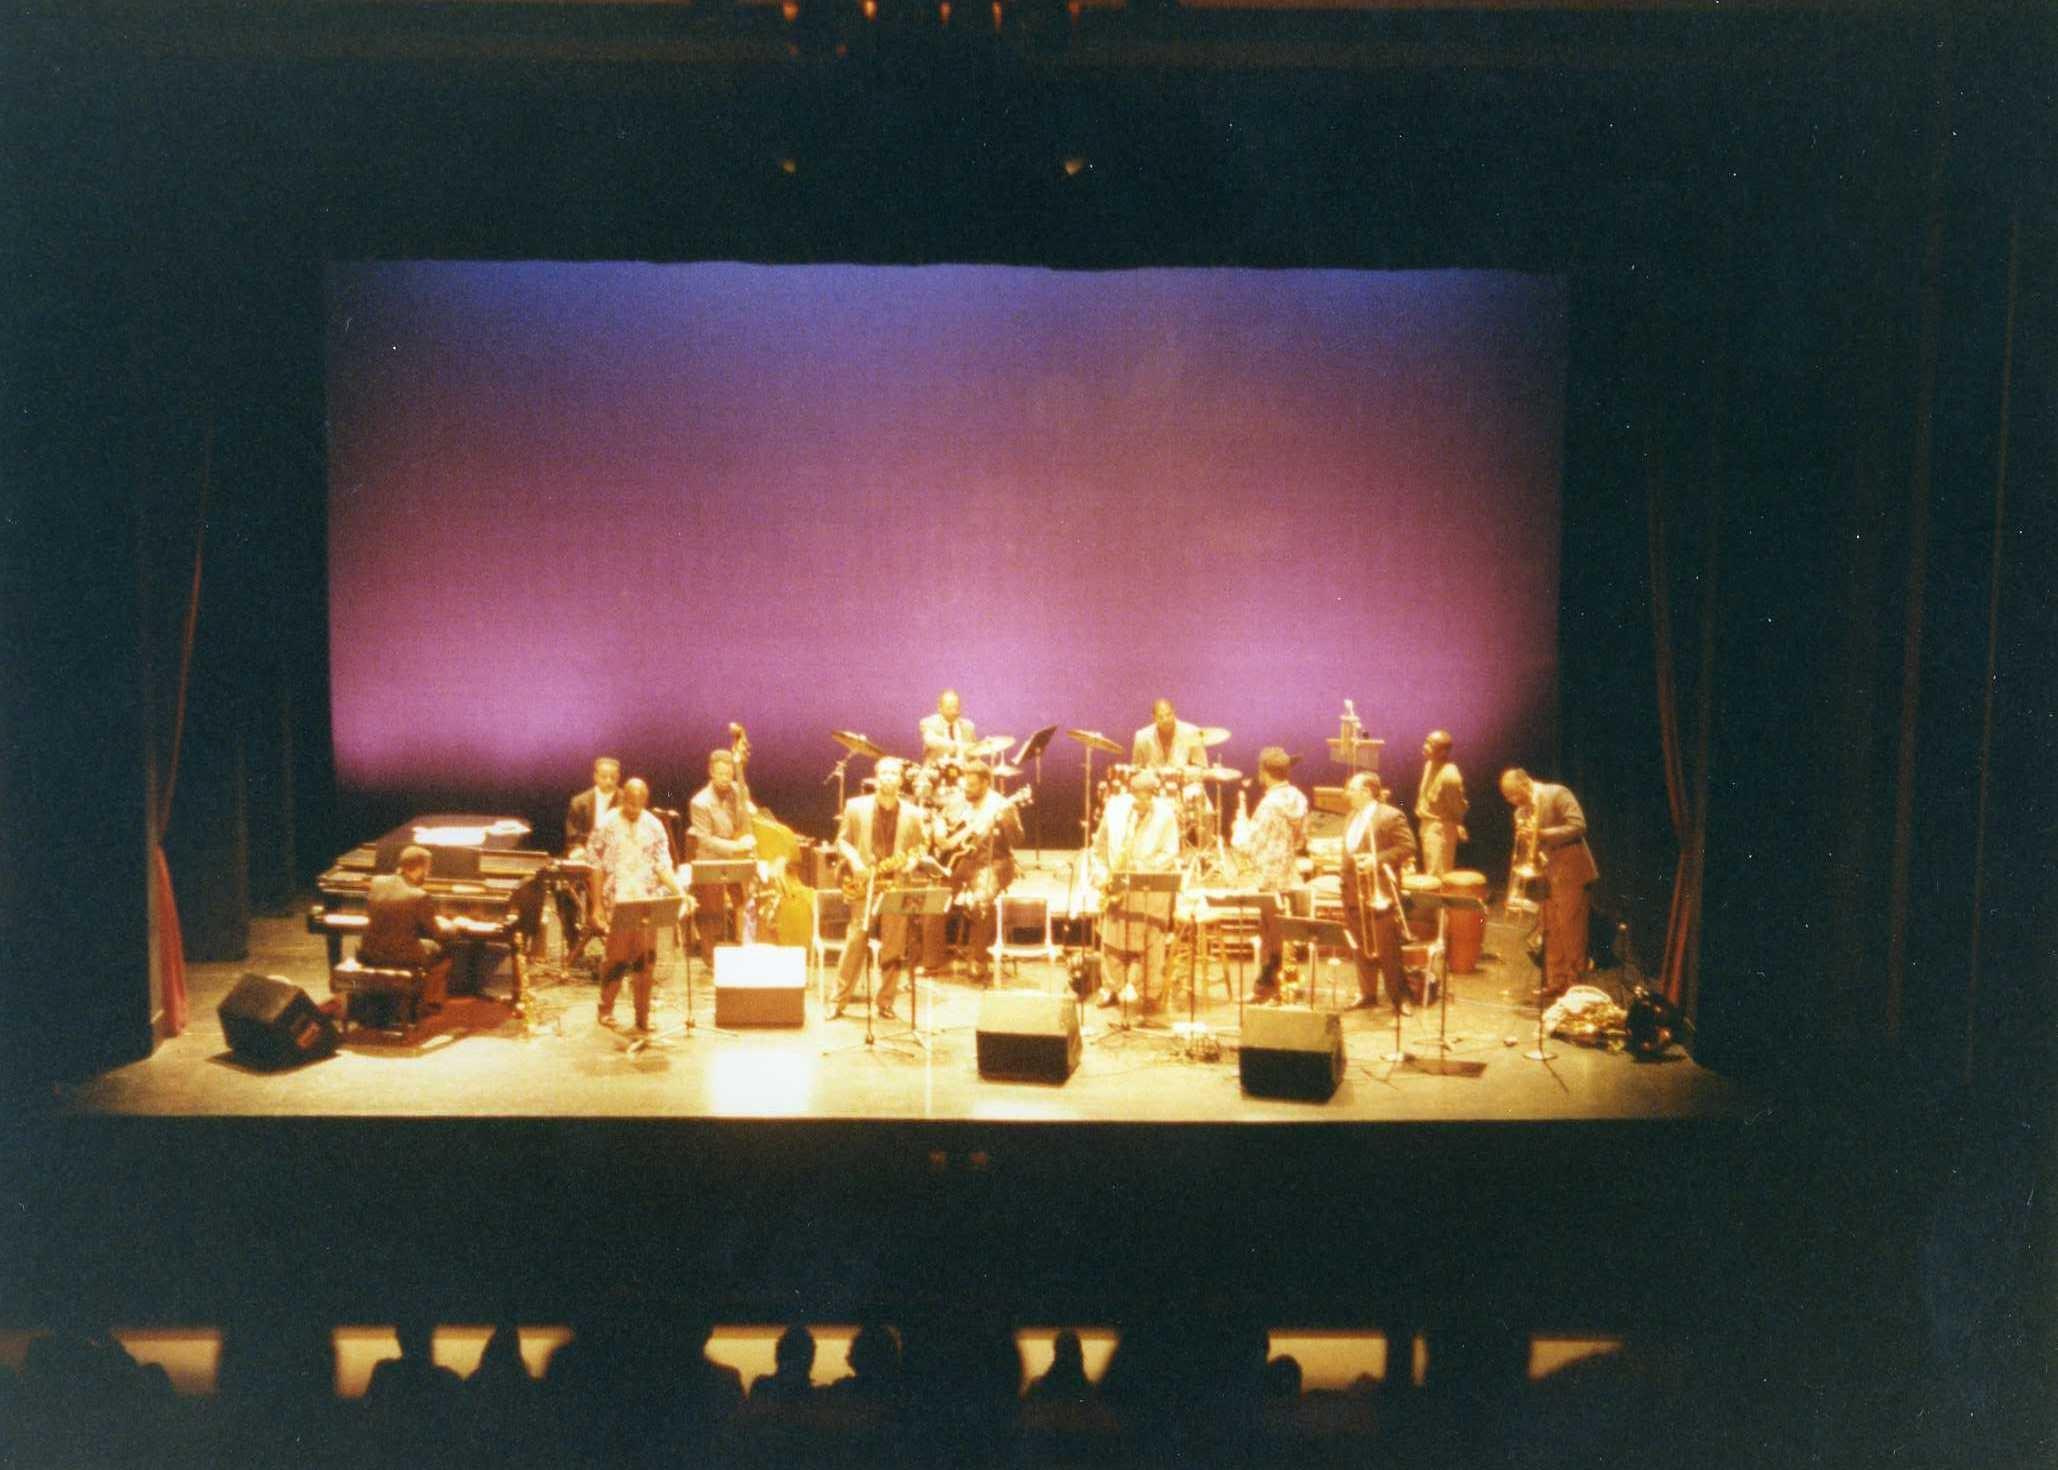 1992 JCMC Ensemble @ Blackman Auditorium - Northeastern University